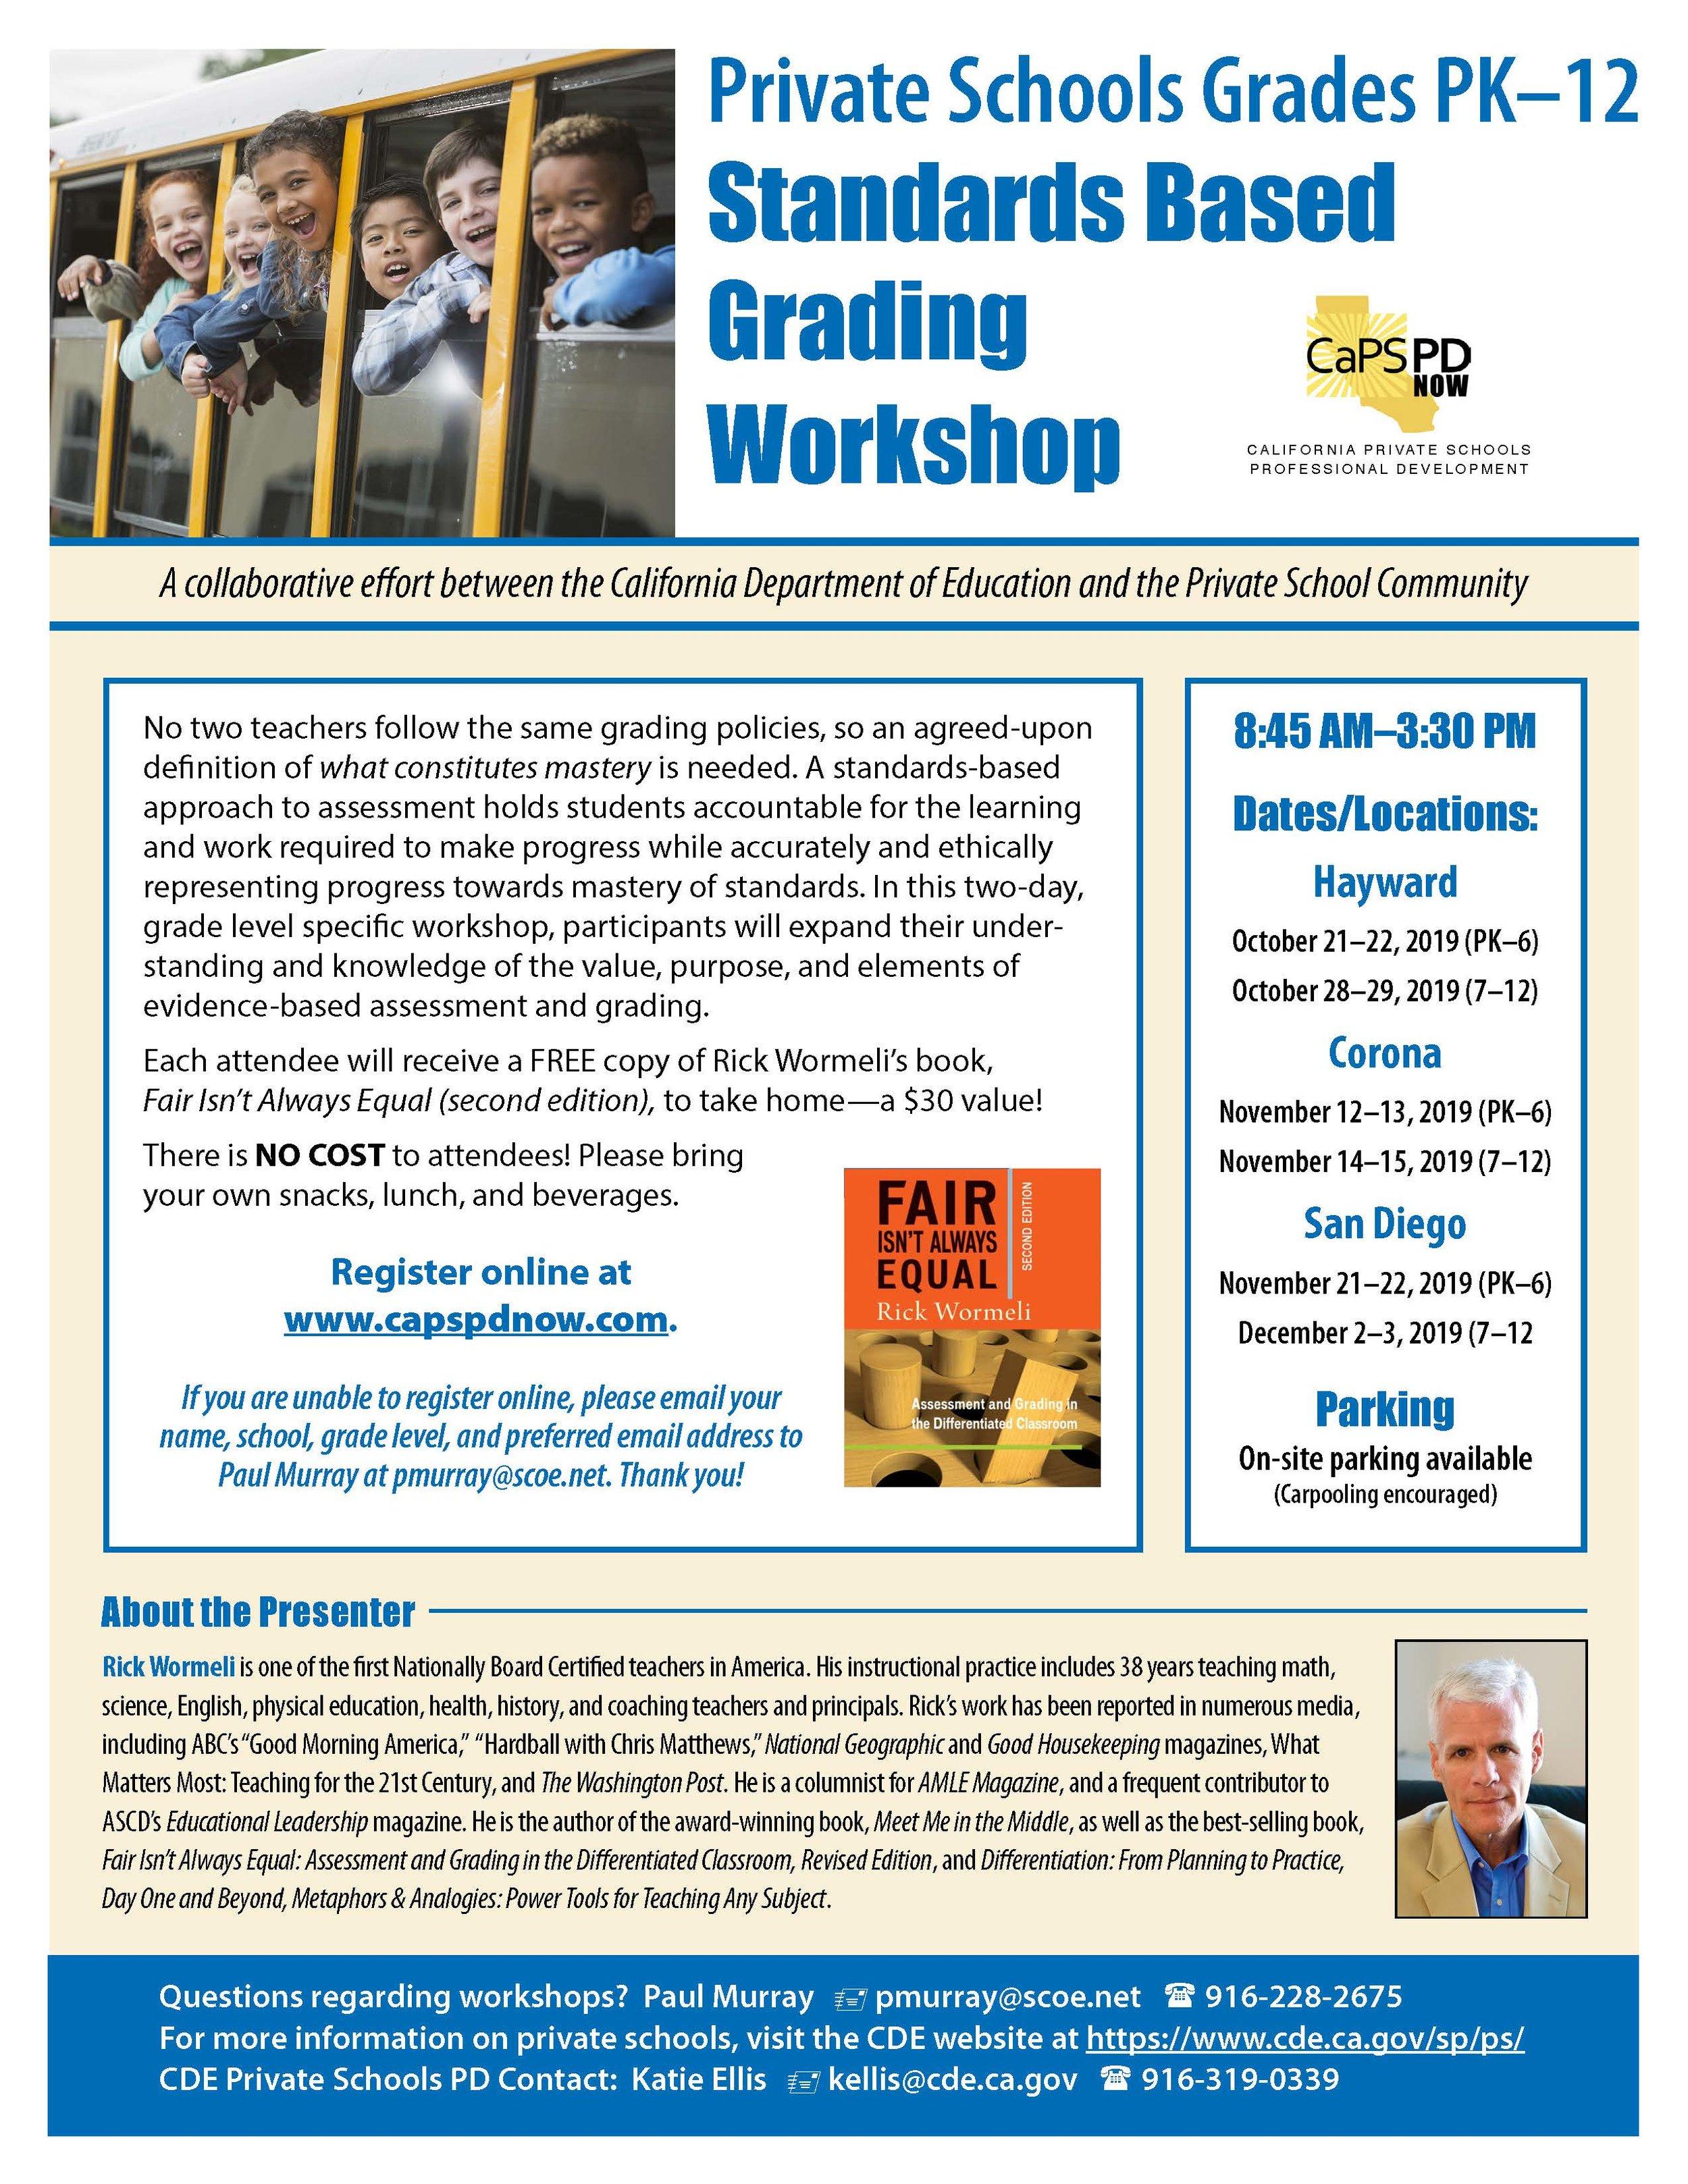 PS_standards_based_grading_flyer_Final.jpg